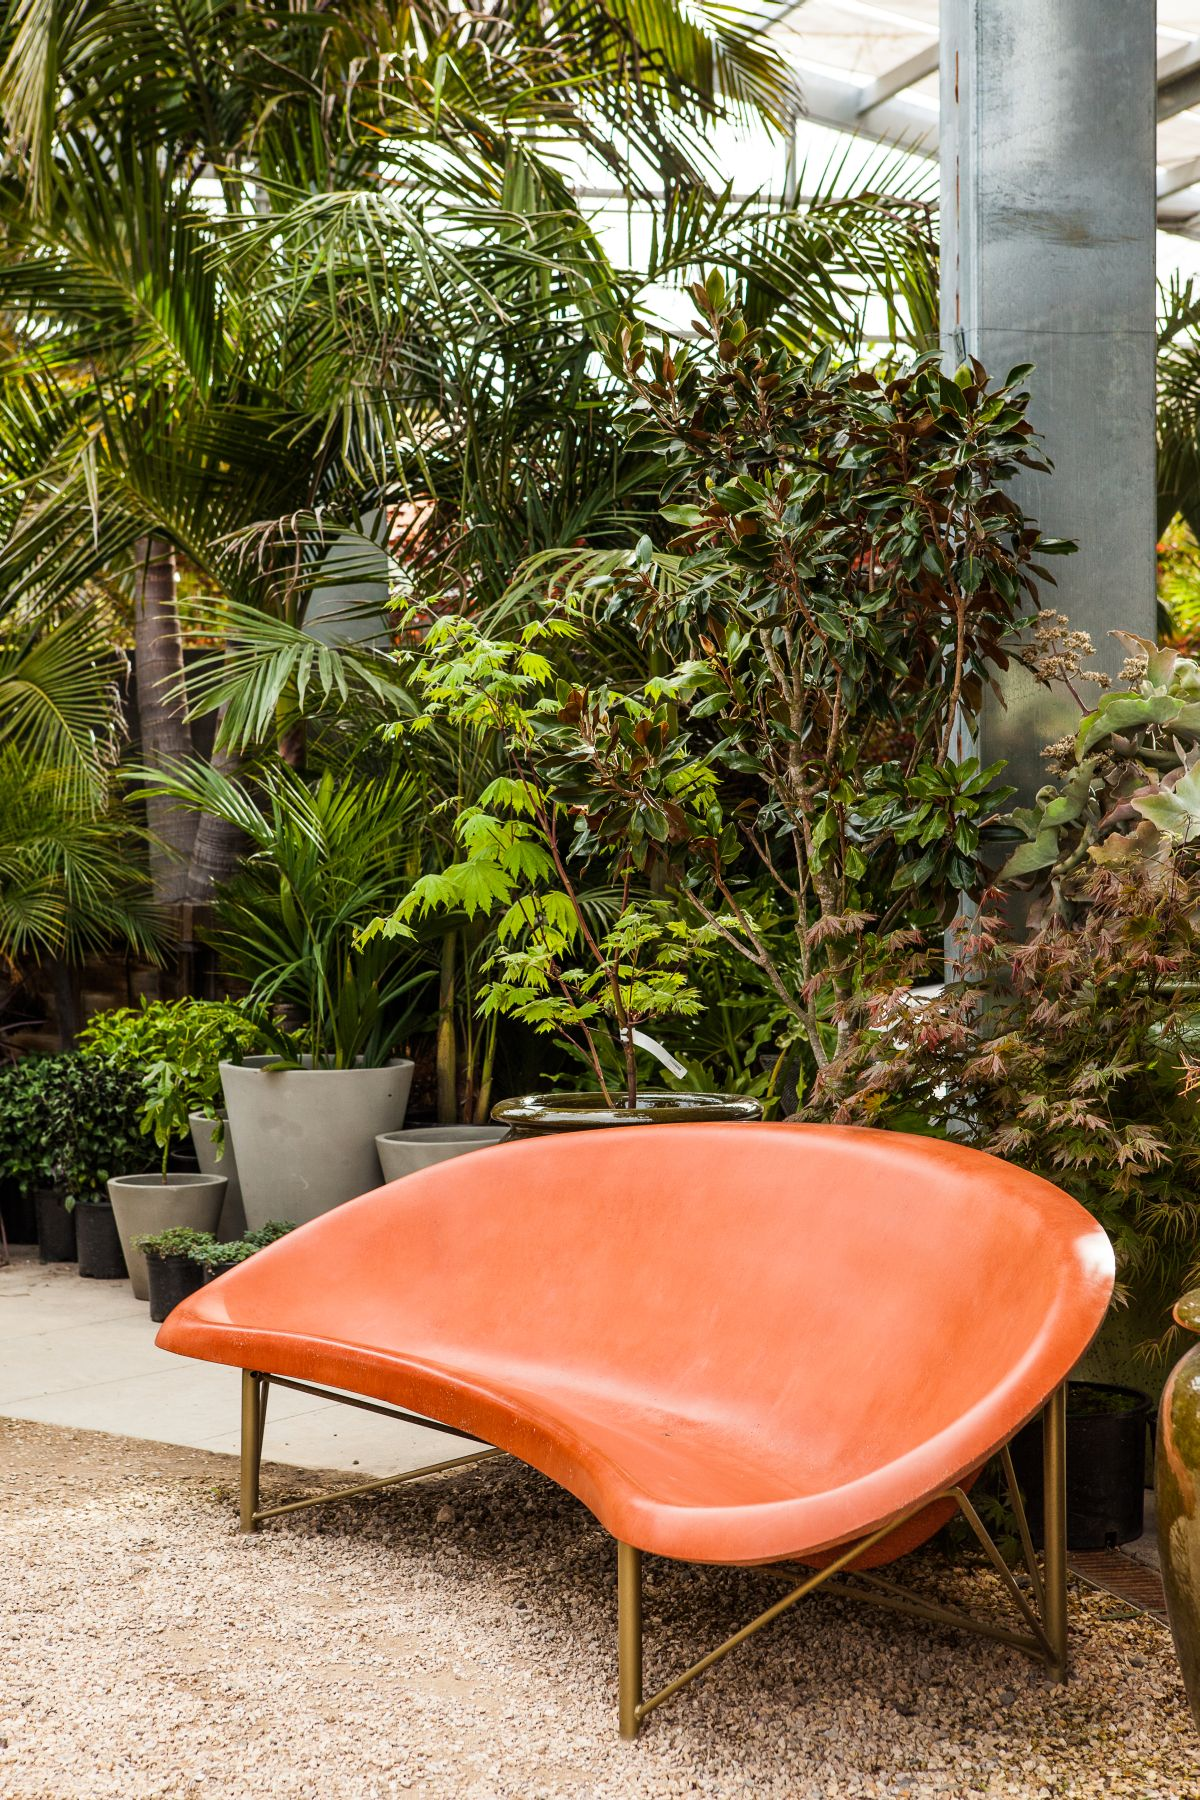 Galanter Amp Jones Heat Up The Outdoor Furniture Market